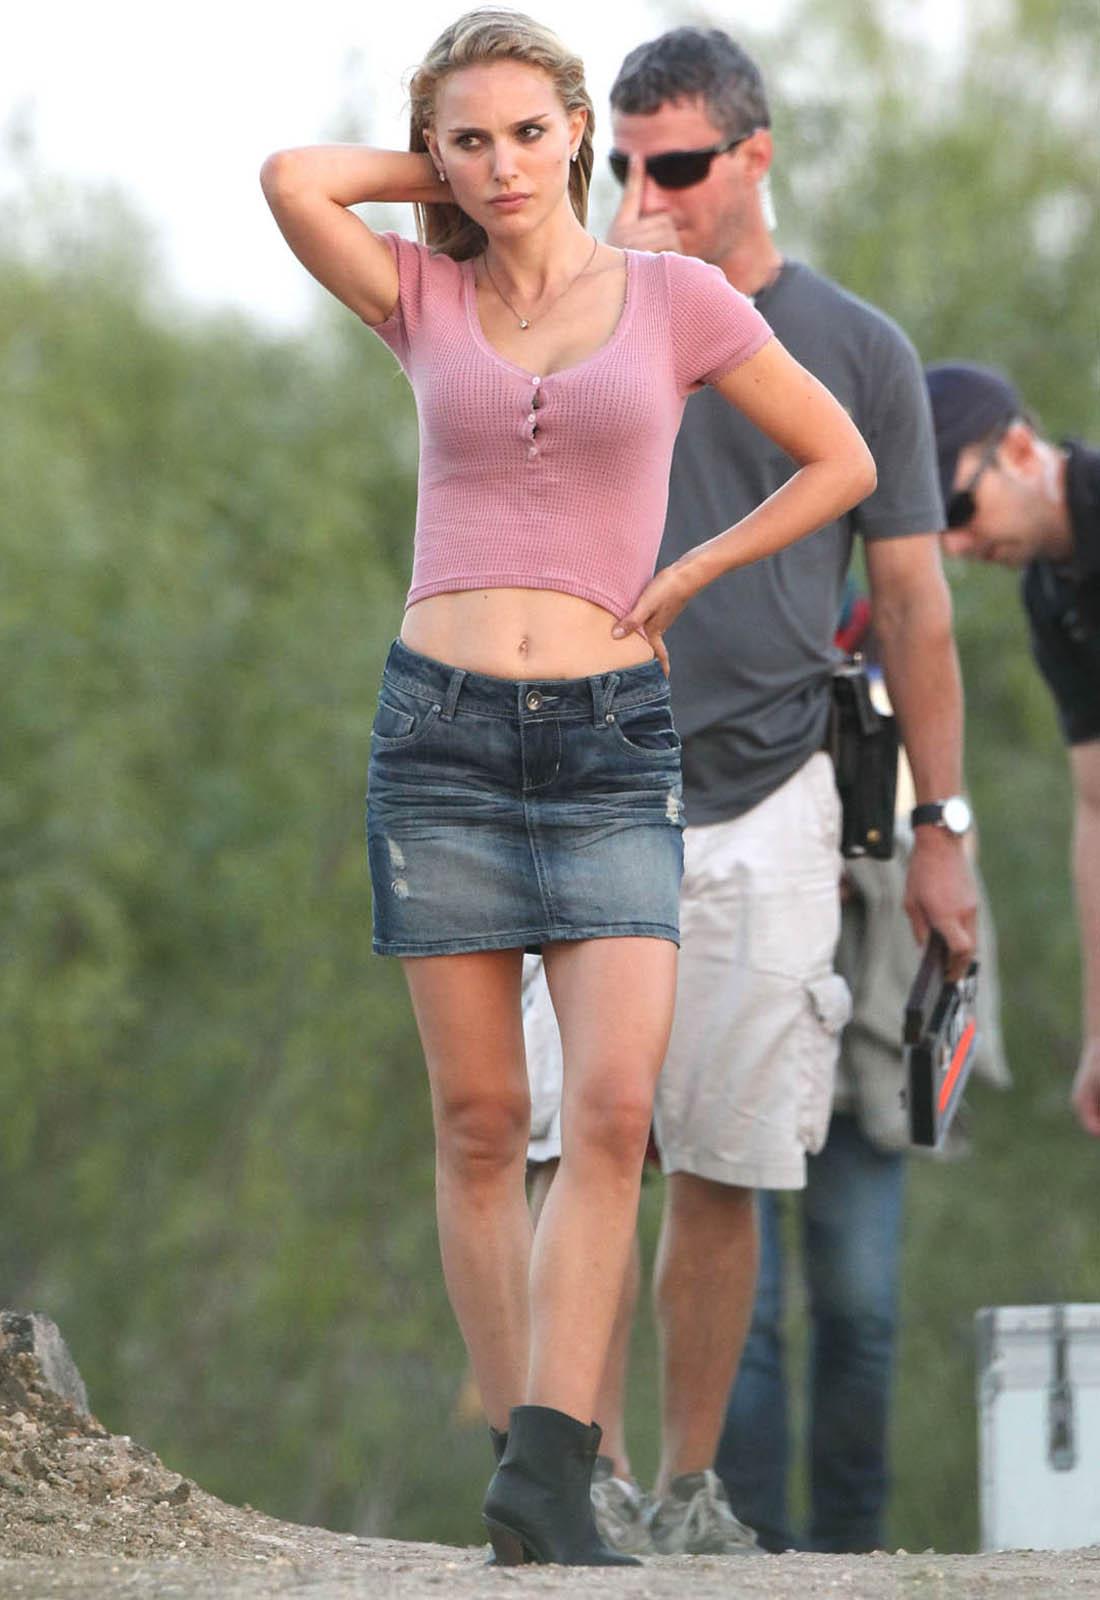 Natalie Portman: Natalie Portman Cleavage Natalie Portman Body